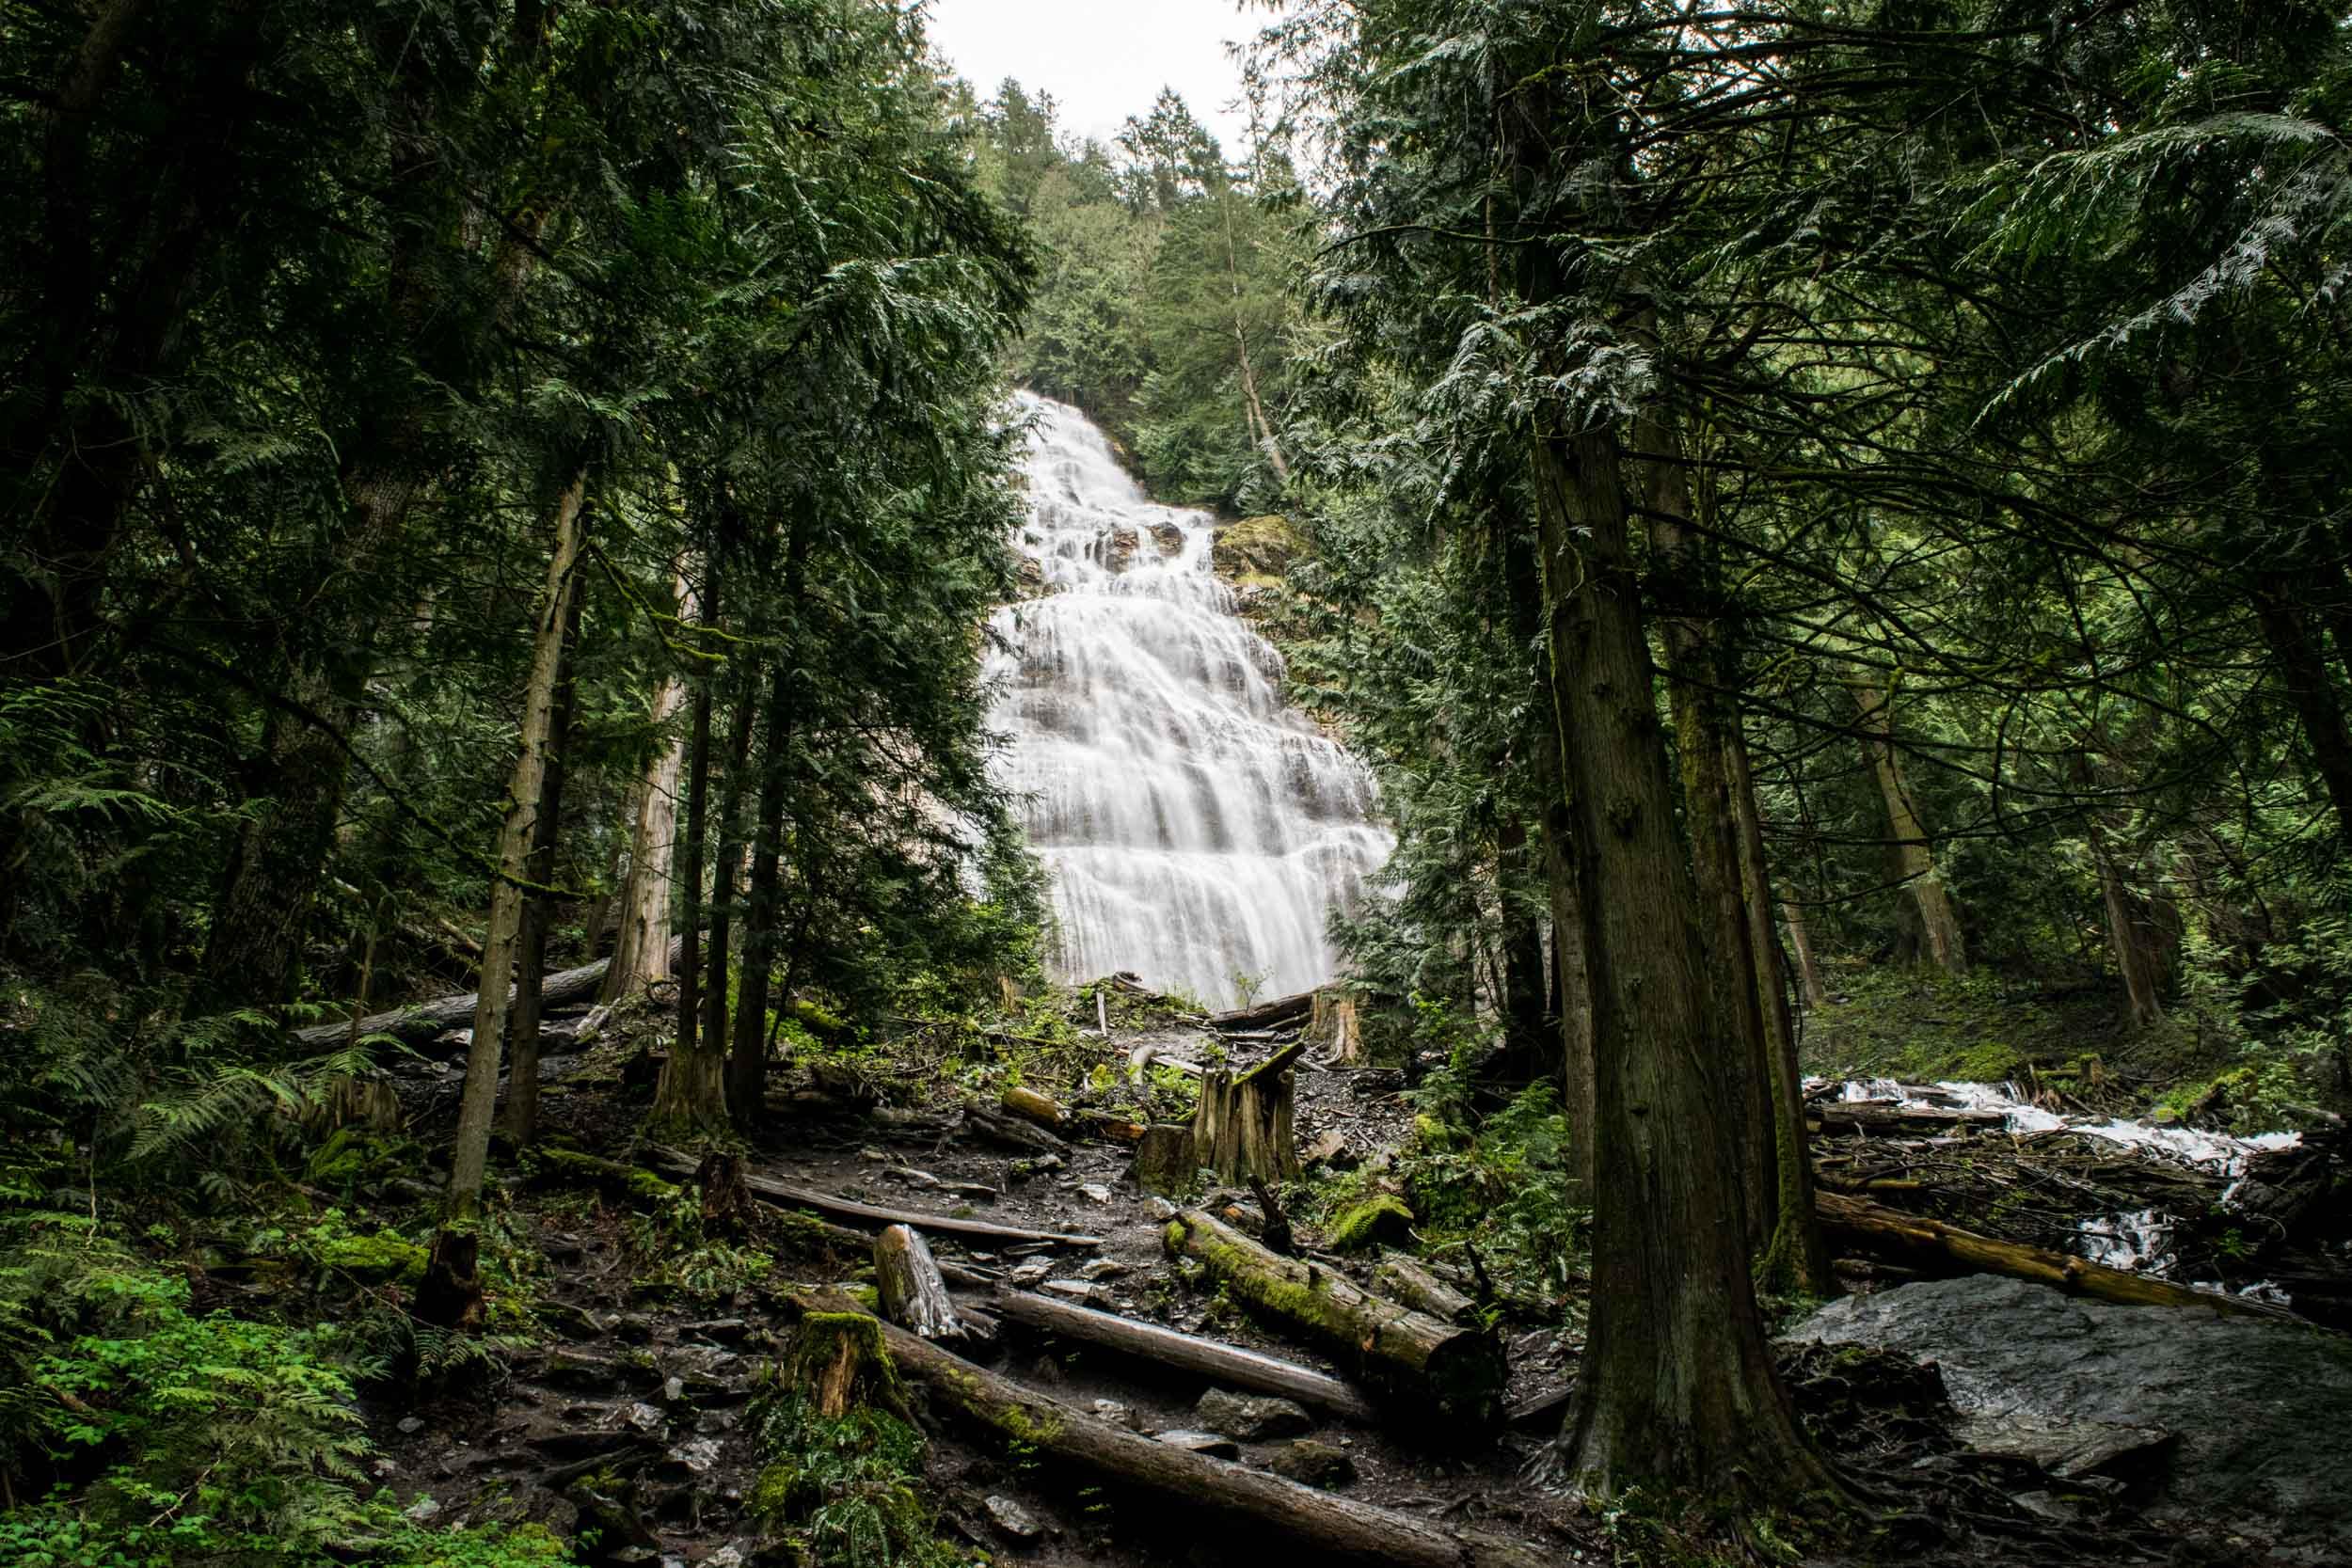 Bridal Veil Falls waterfall in Chilliwack, British Columbia, Canada.